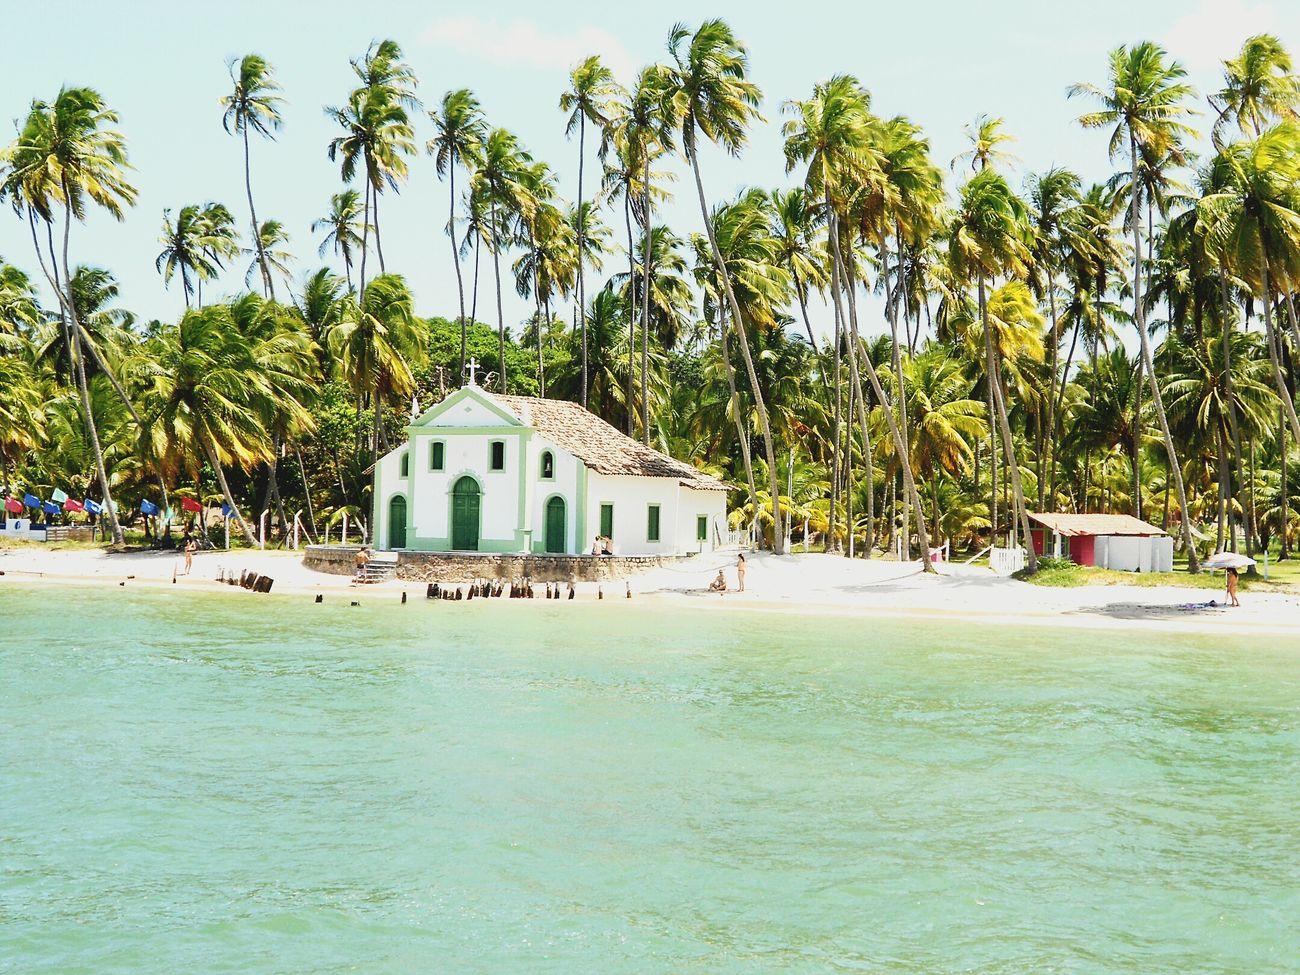 Relaxing Igreja Praia Dos Carneiros Pernambuco Natureza